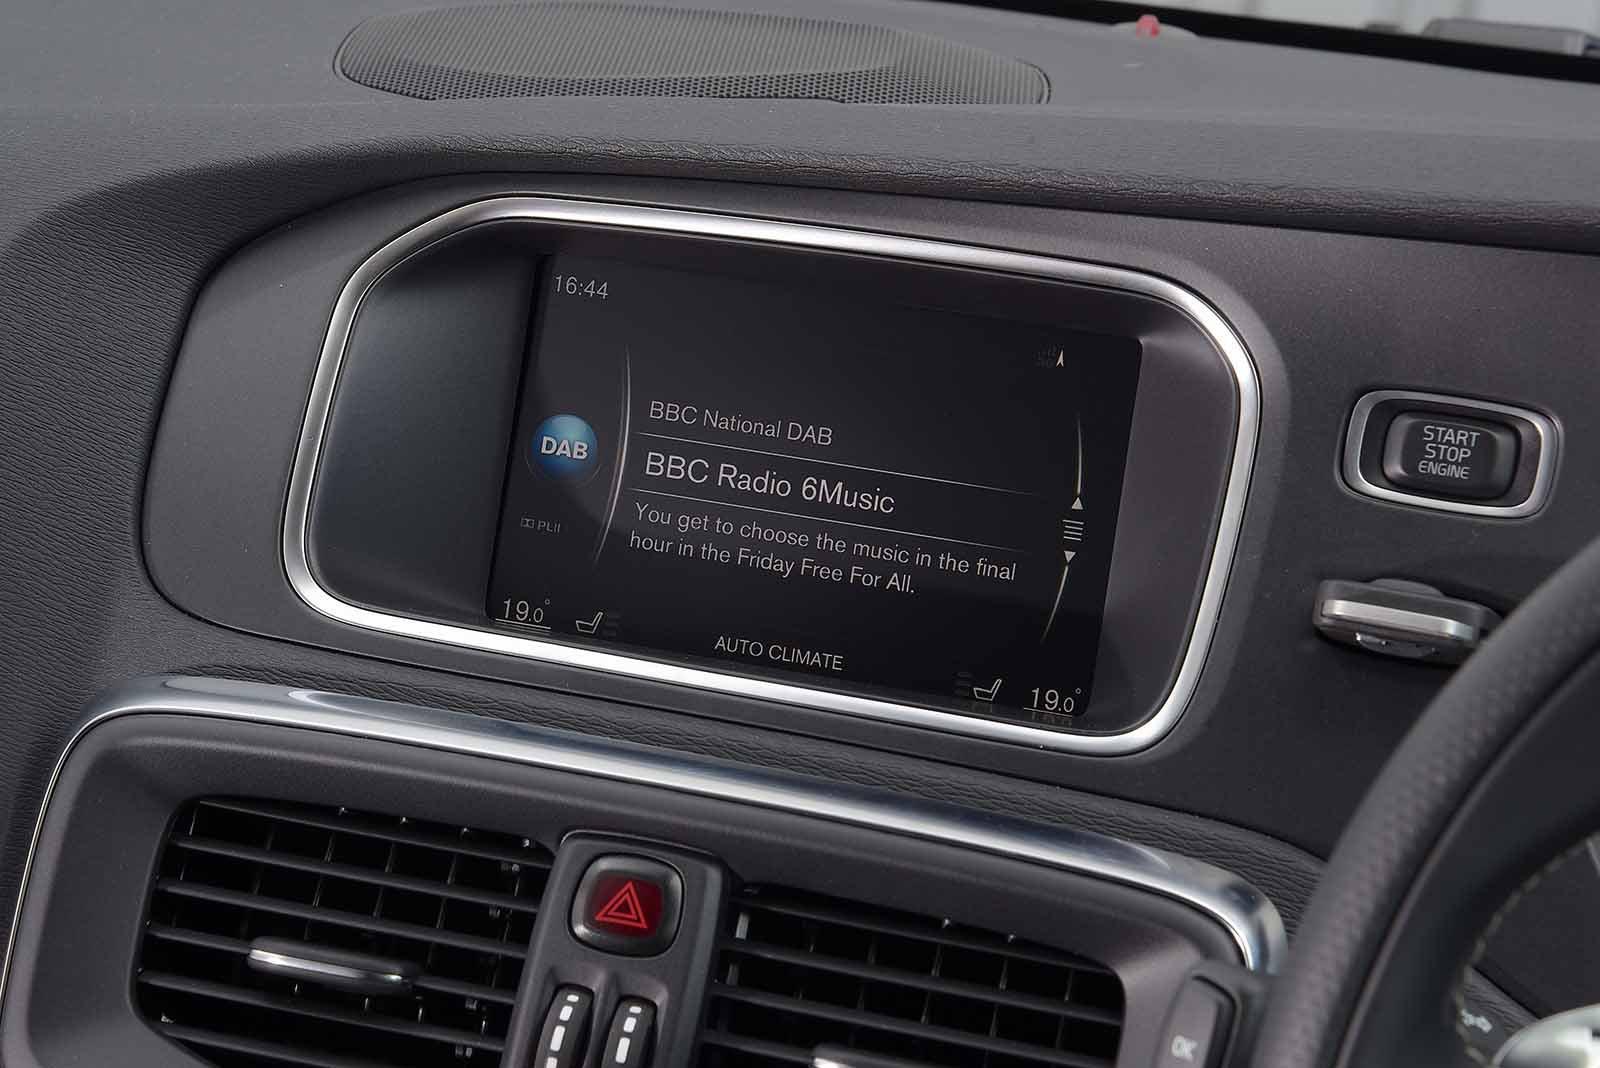 Volvo V40 68-plate RHD infotainment